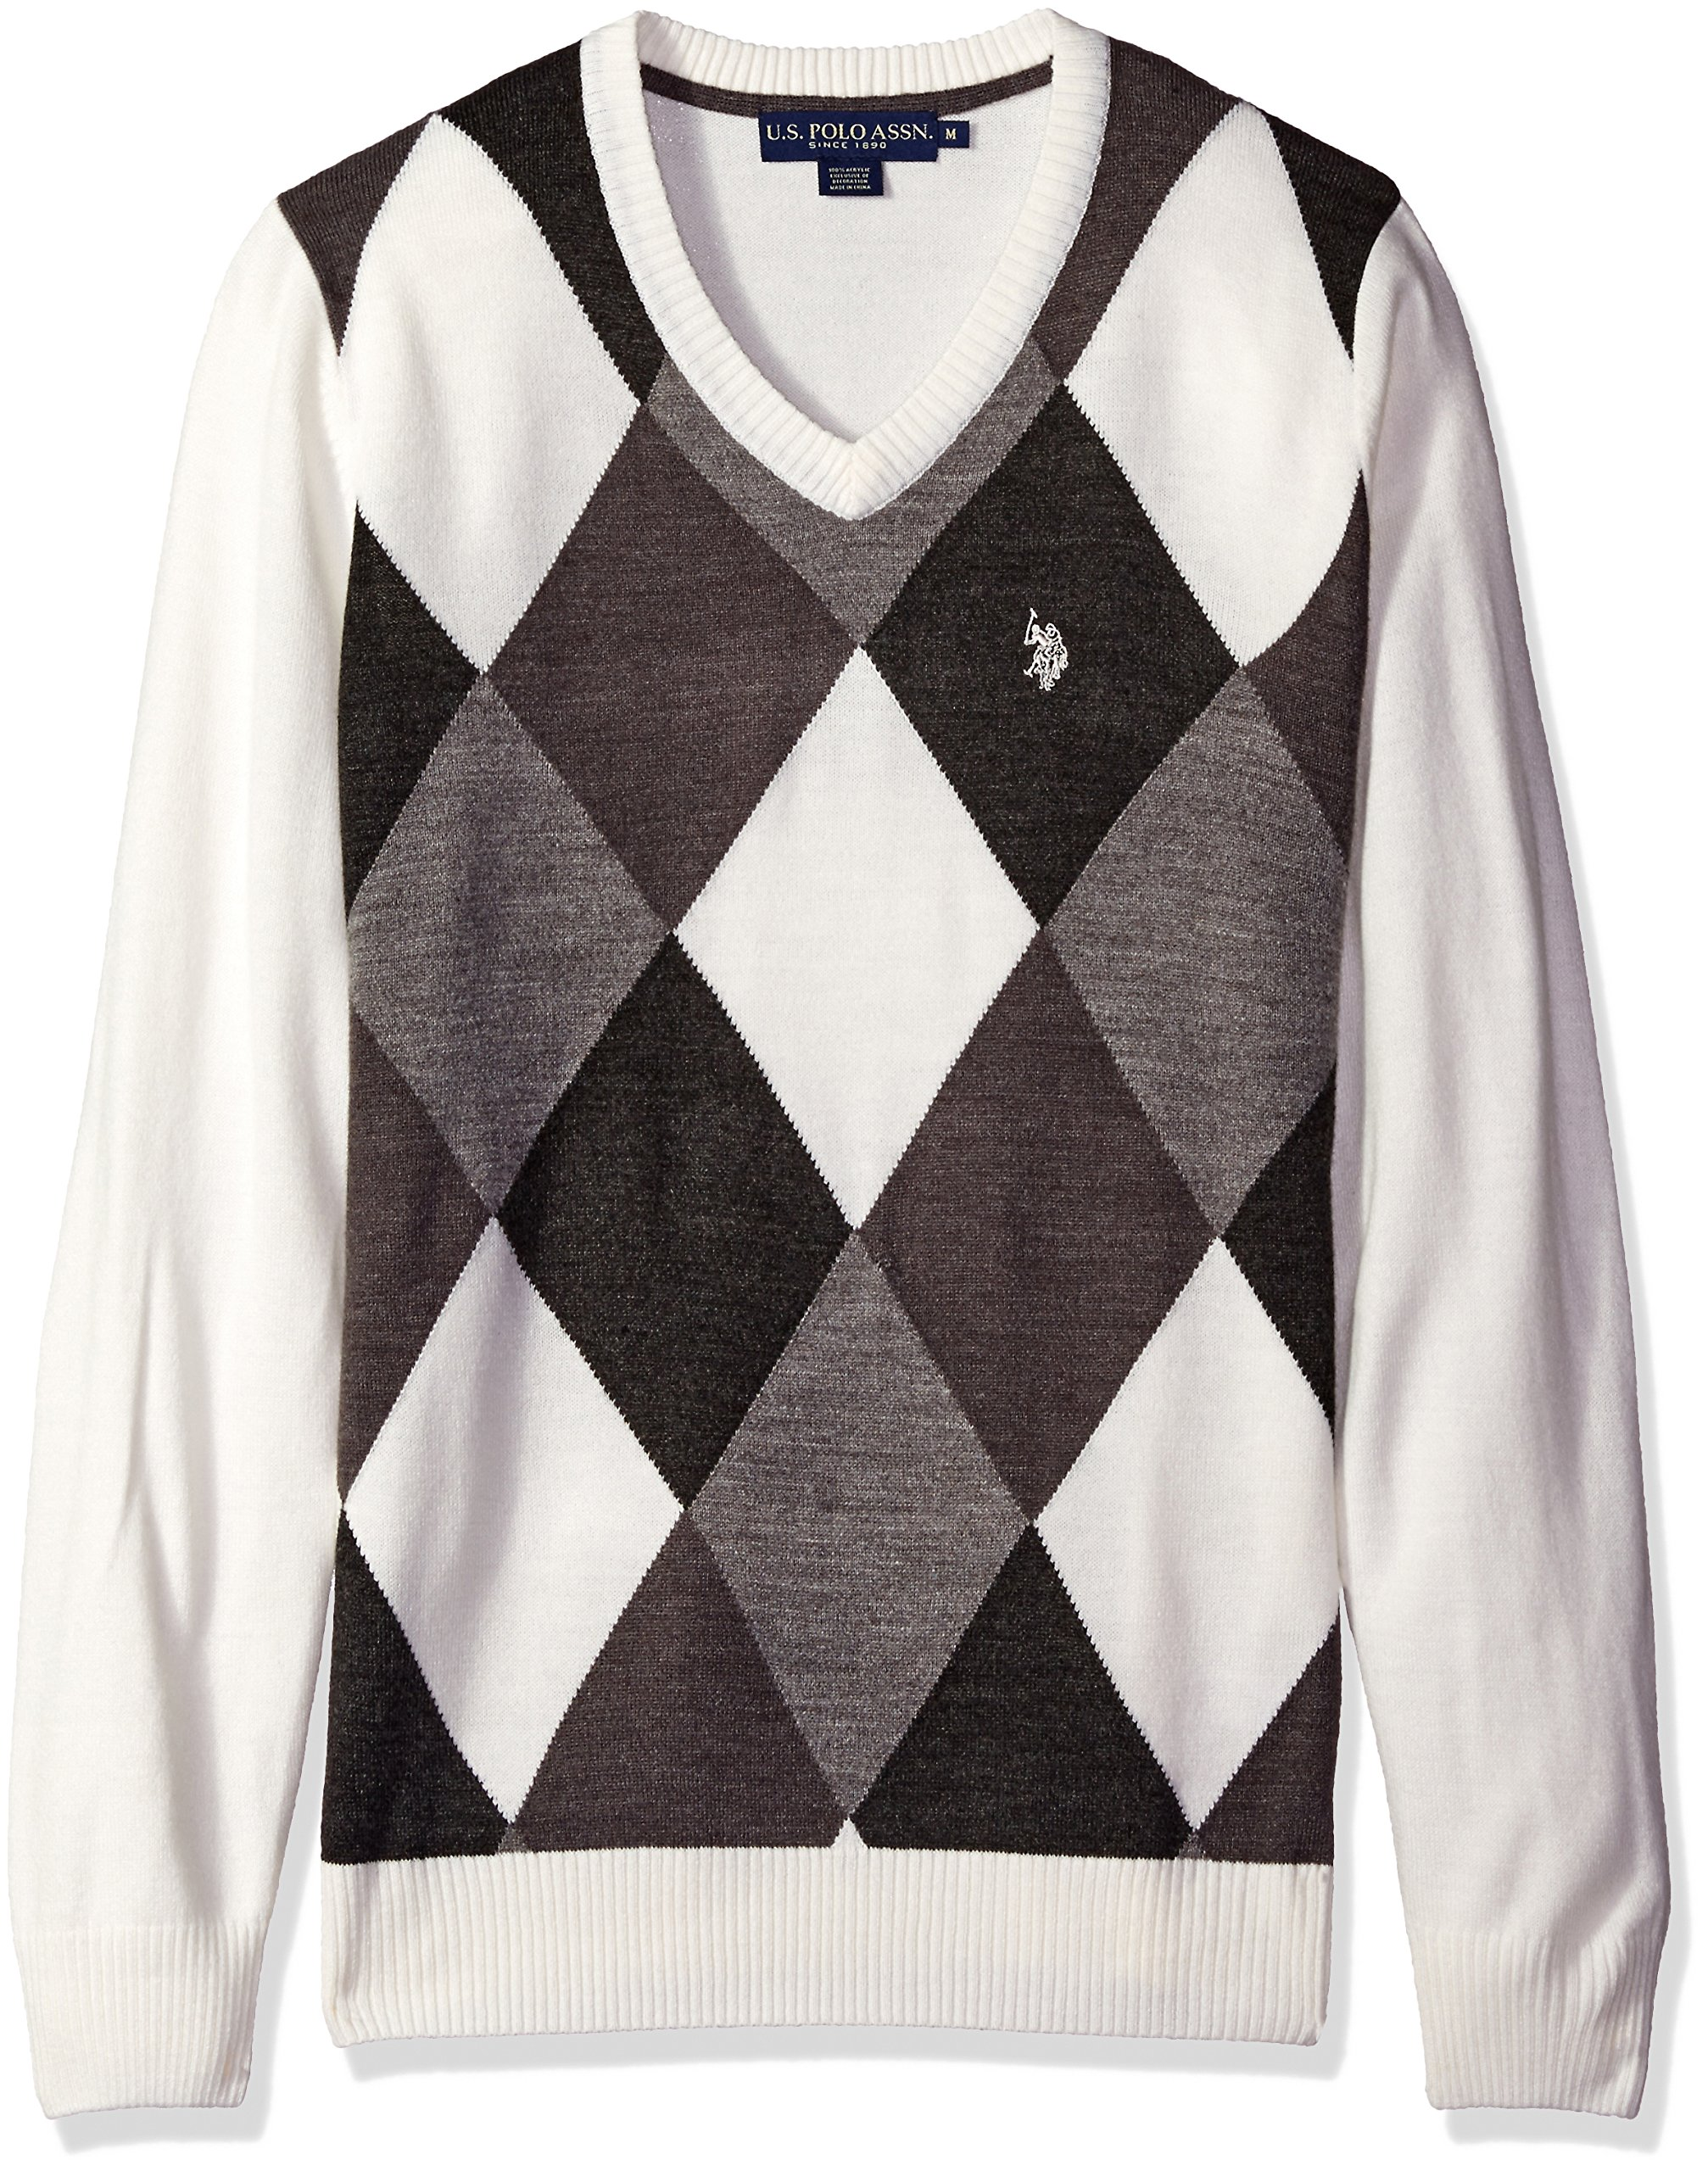 U.S. Polo Assn. Men's Argyle V-Neck Sweater, Winter White, Medium